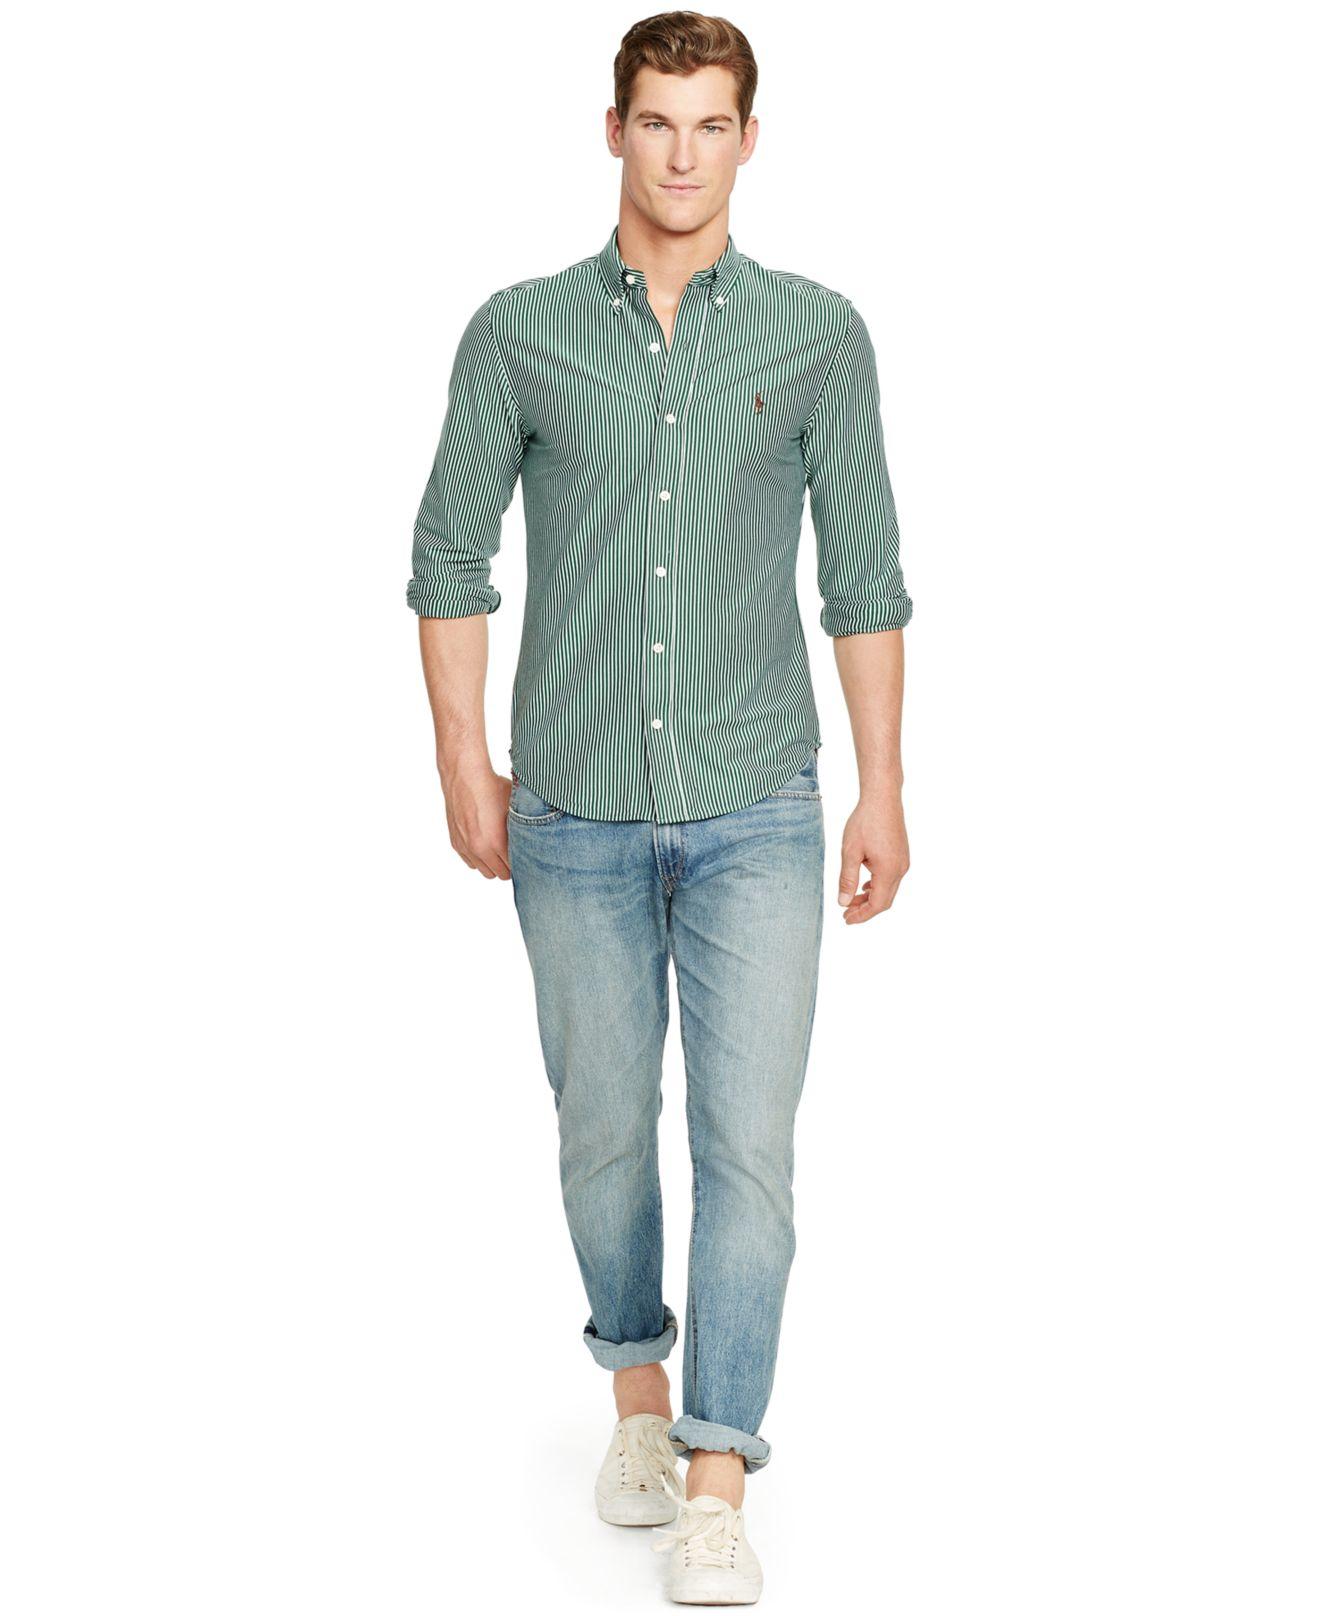 Lyst Polo Ralph Lauren Striped Knit Dress Shirt In Green For Men